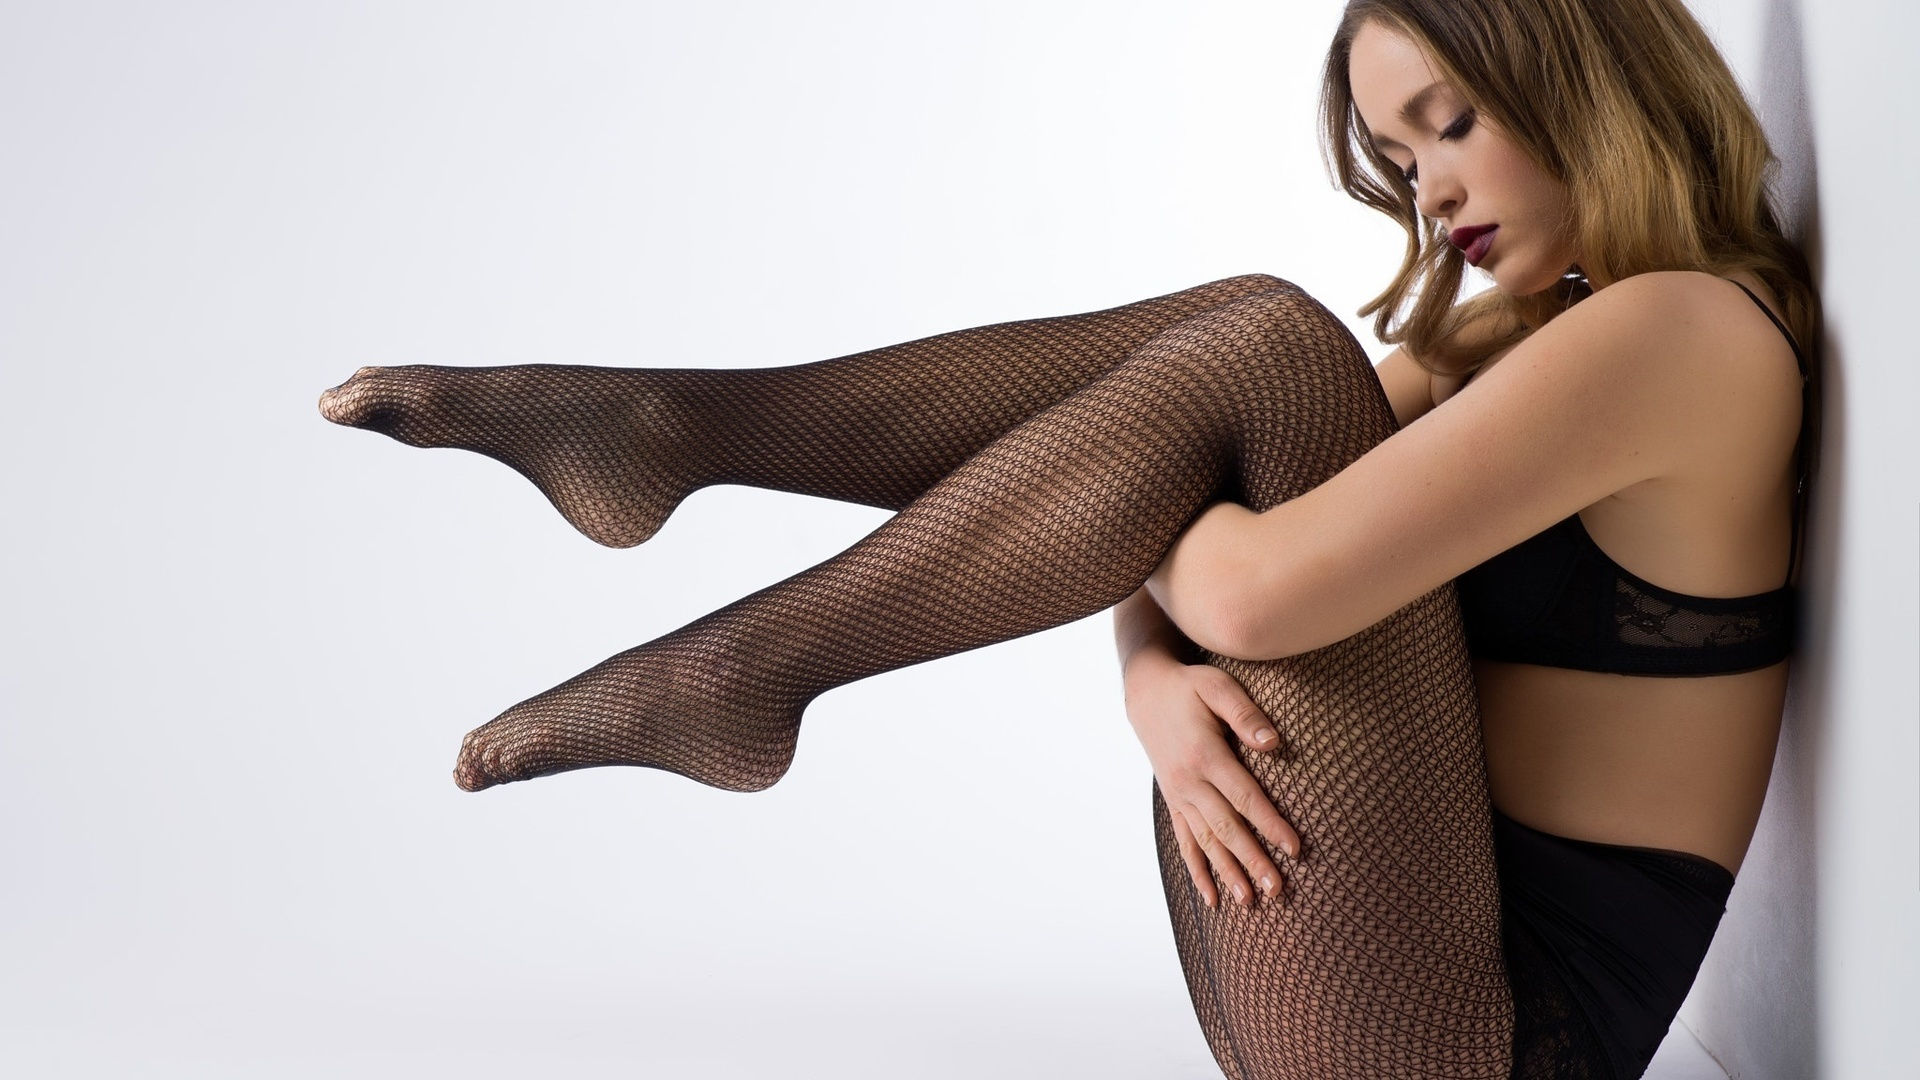 Чулки порно групповое онлайн